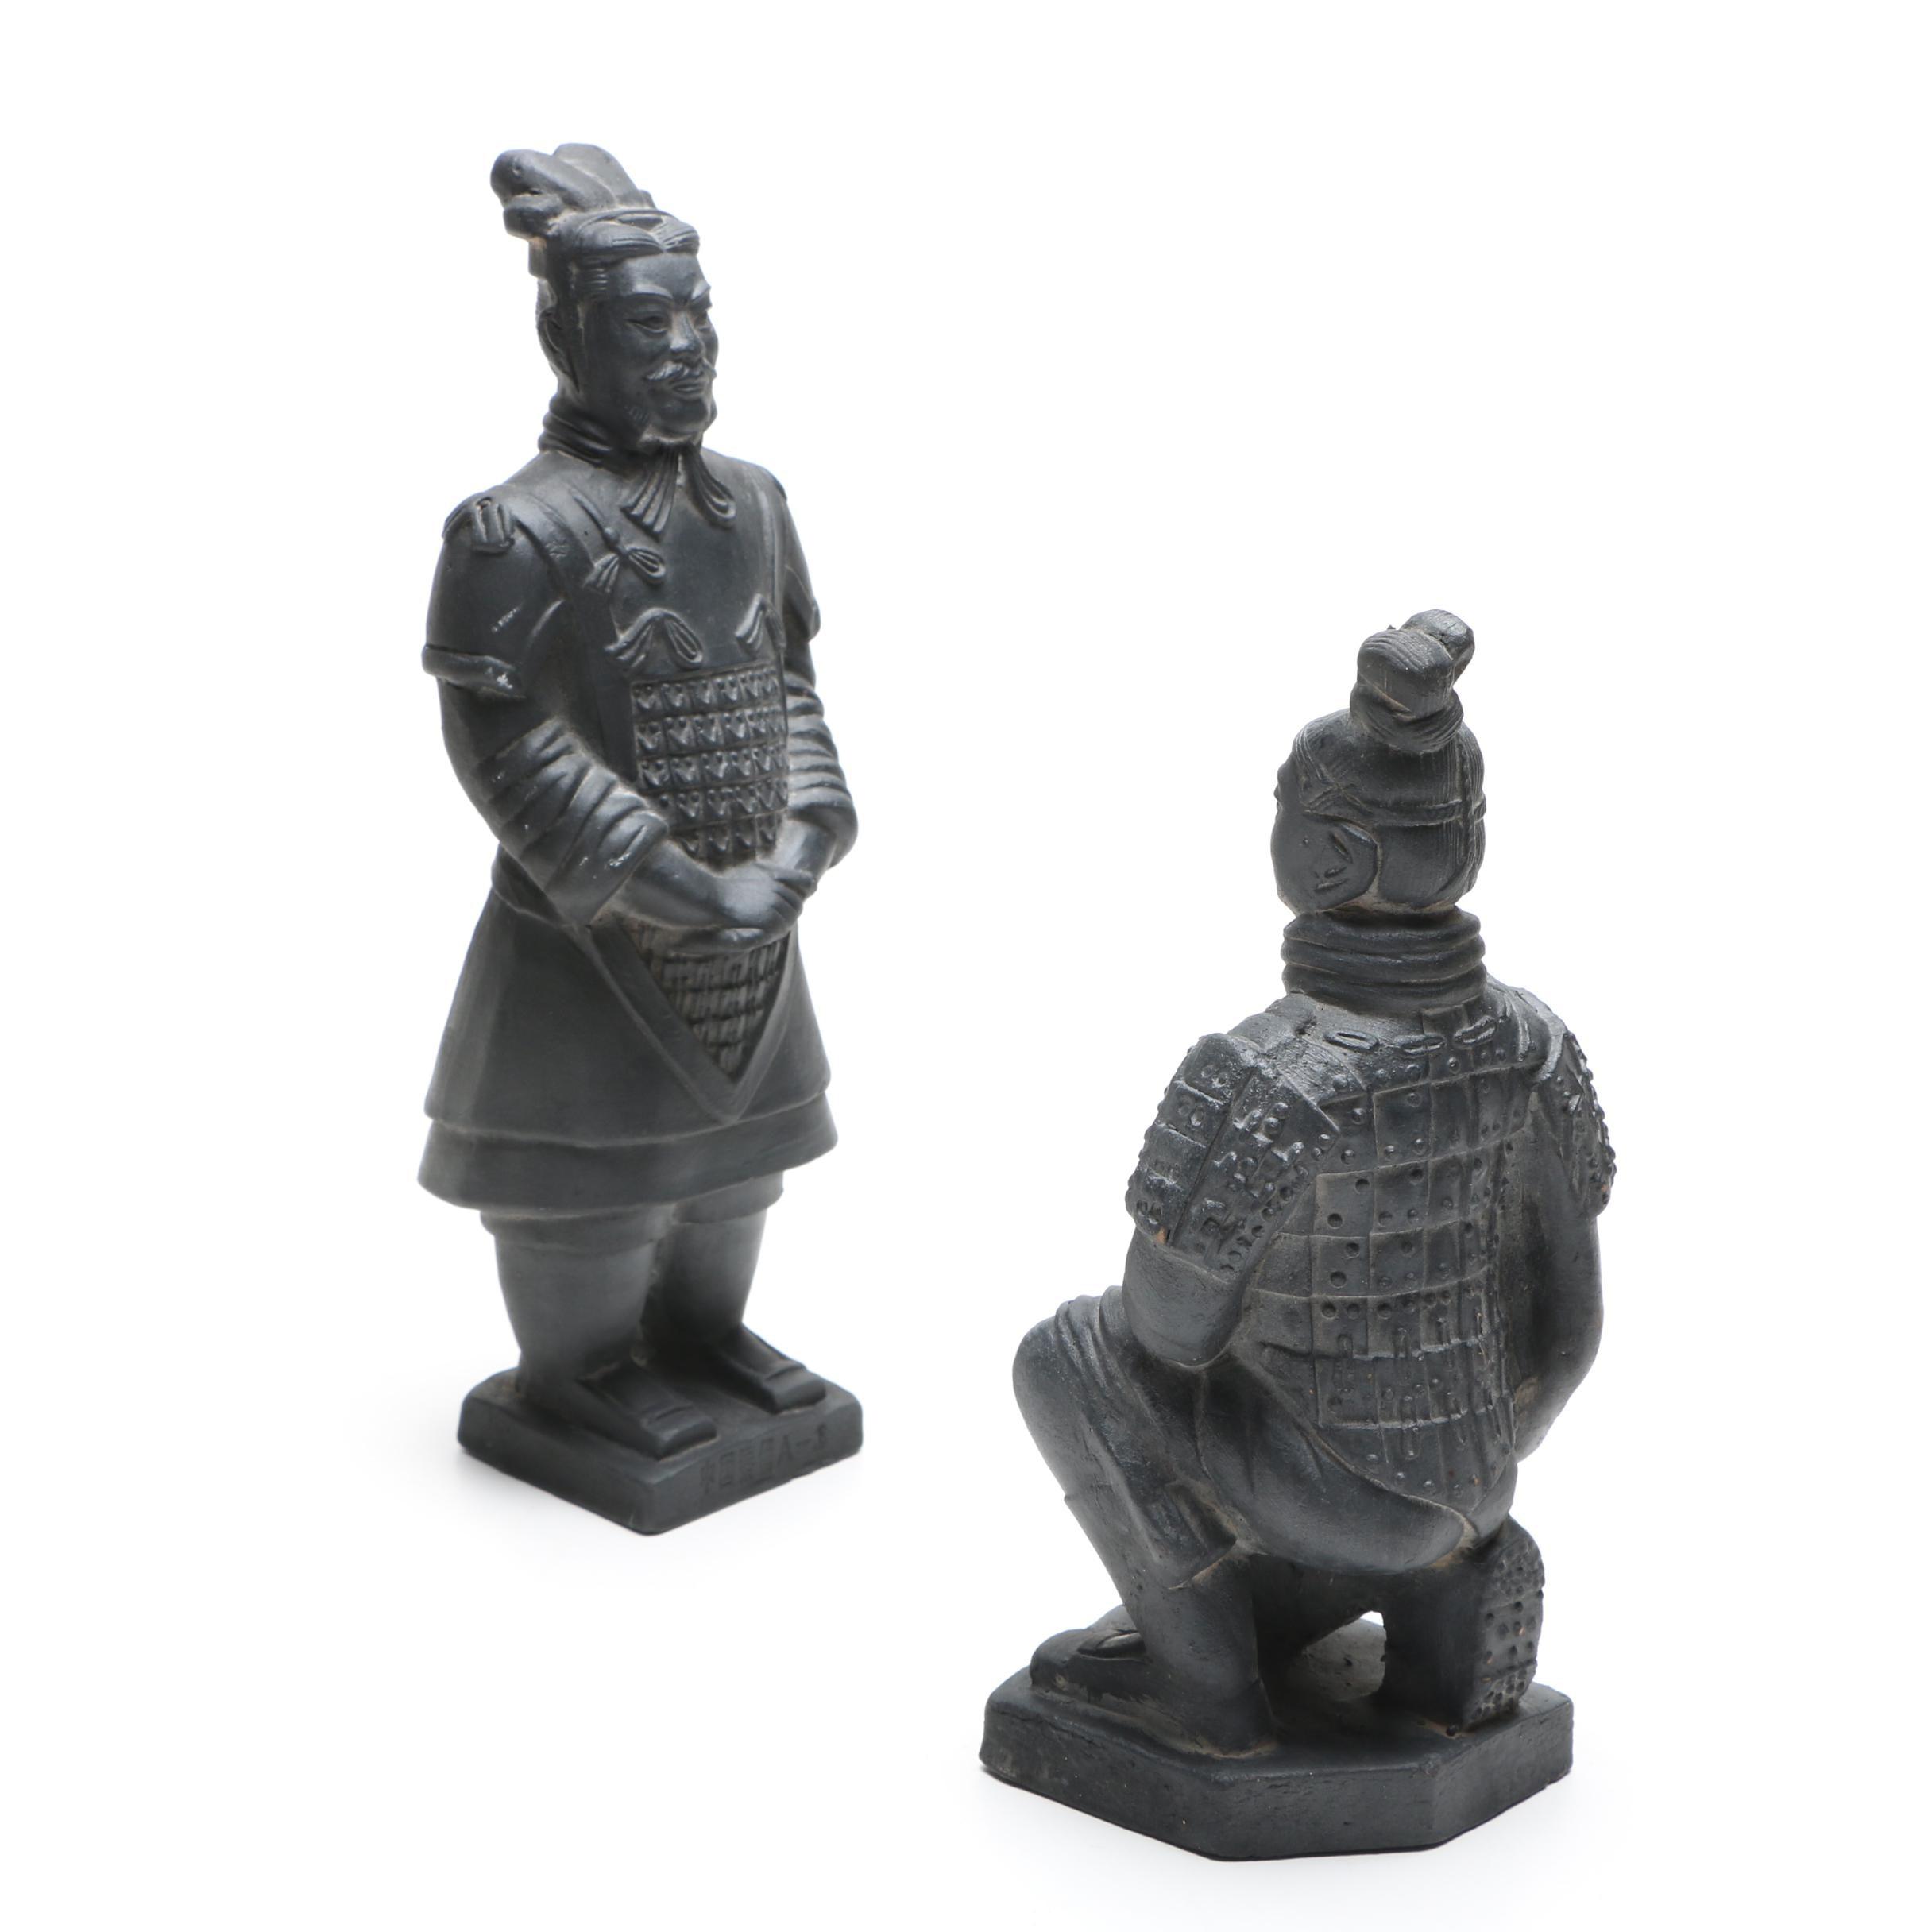 Reproduction Qin Shi Huangdi's Terra Cotta Warriors